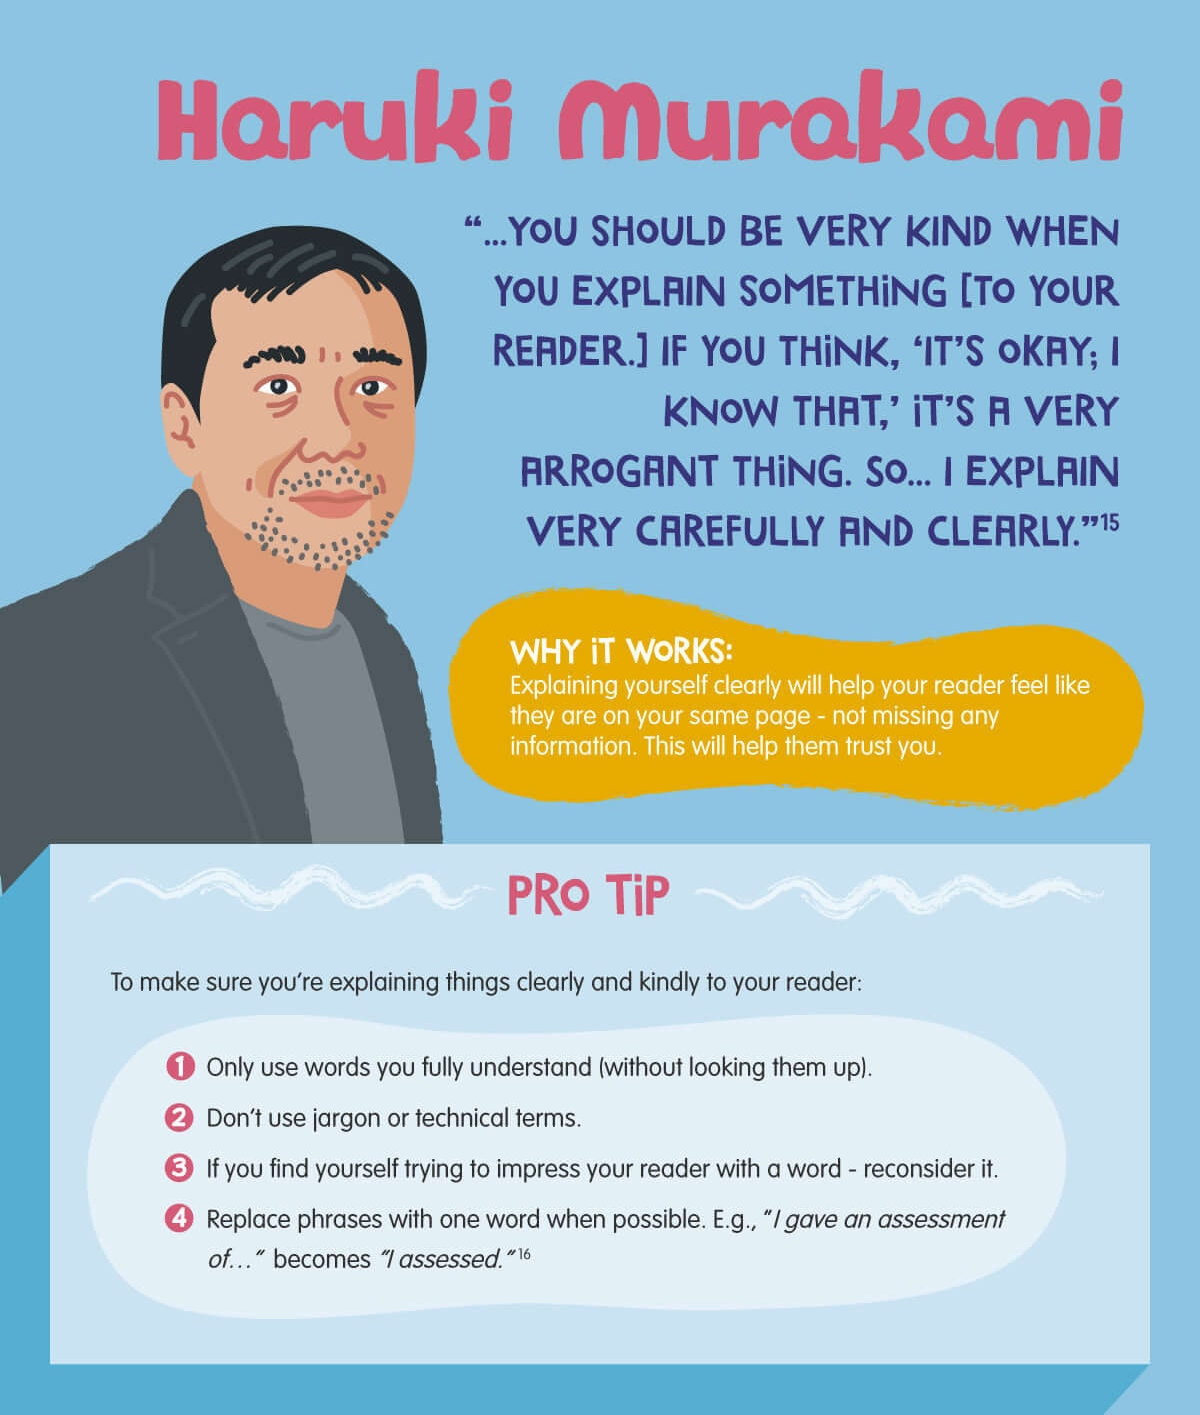 Haruki Murakami writing advice